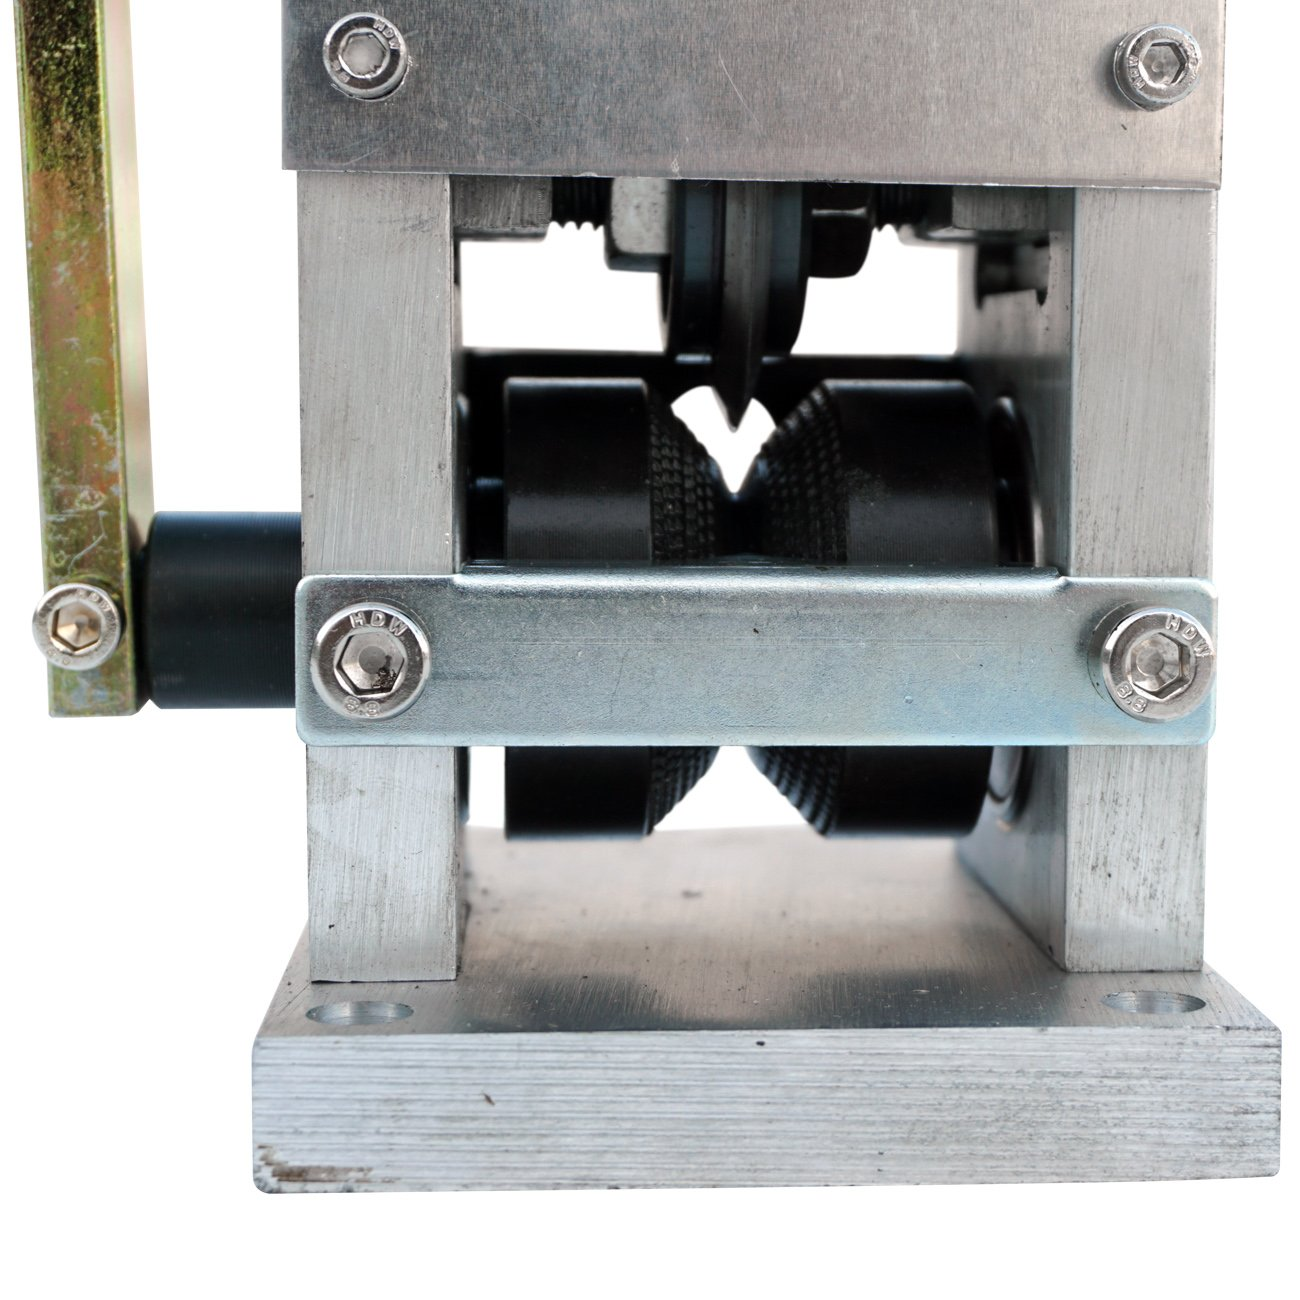 Kabel Stripper Draht Abisoliermaschine Kupfer Recycle φ1.5 mm ...